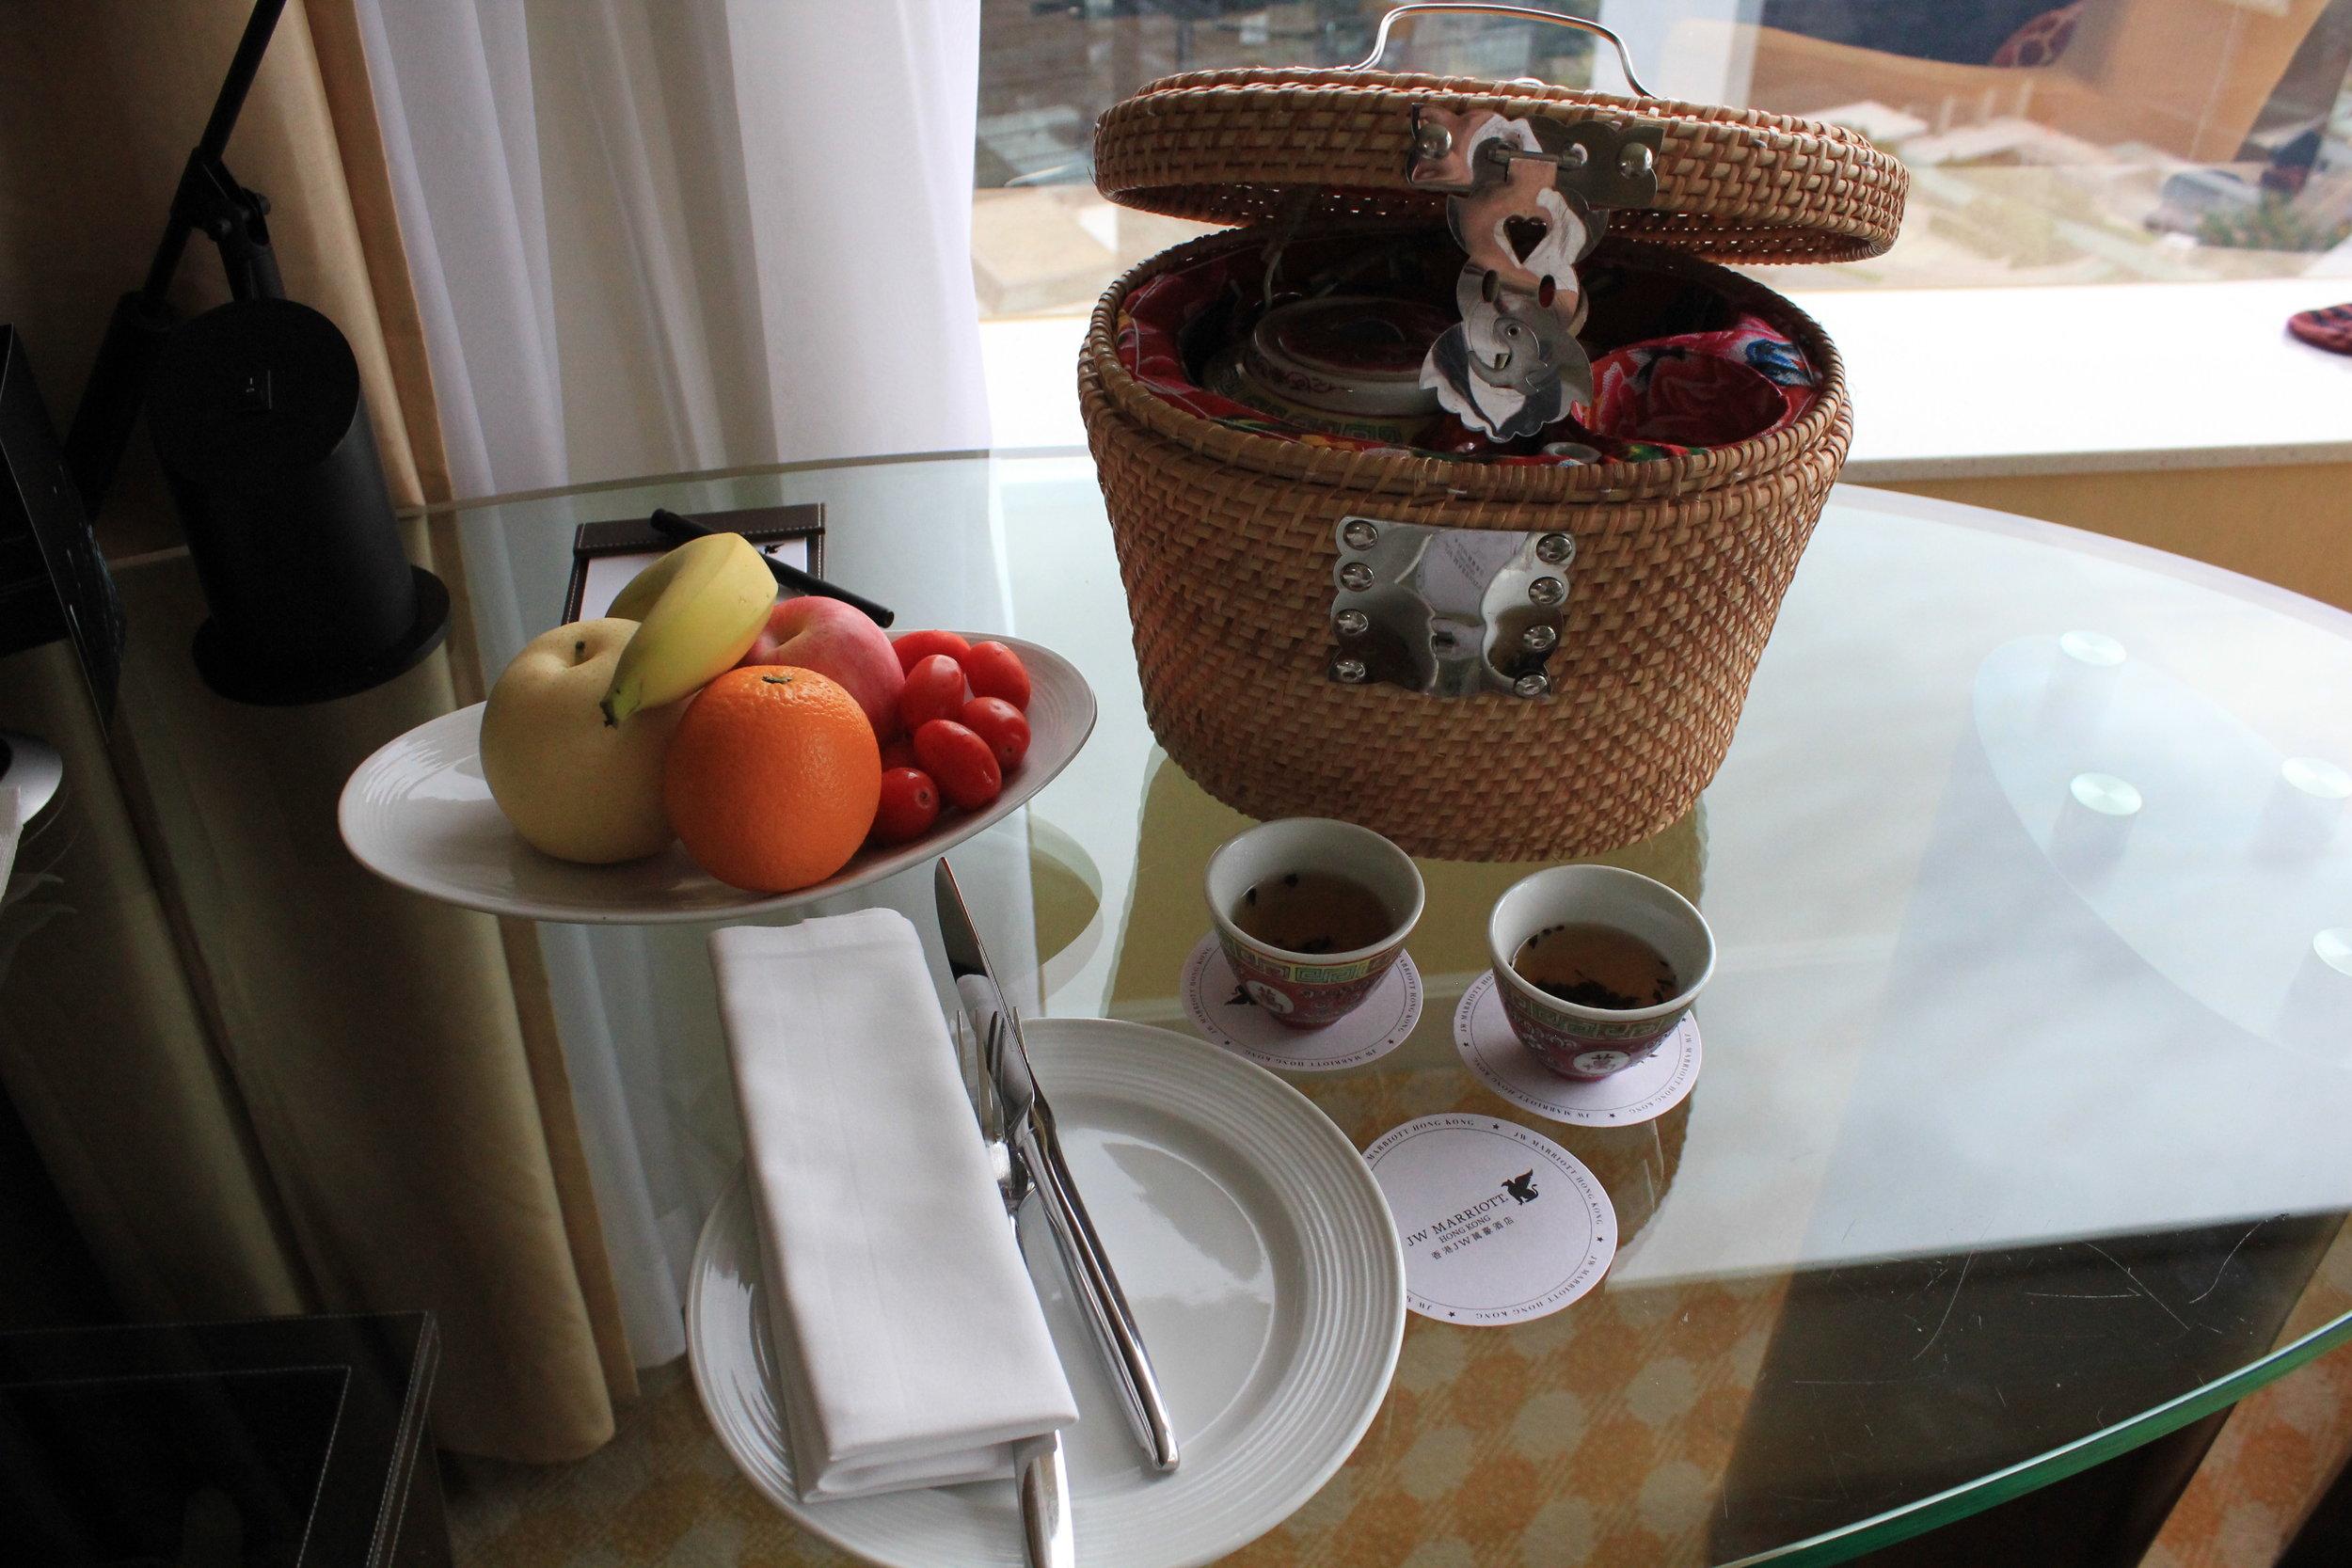 JW Marriott Hong Kong – Welcome amenity